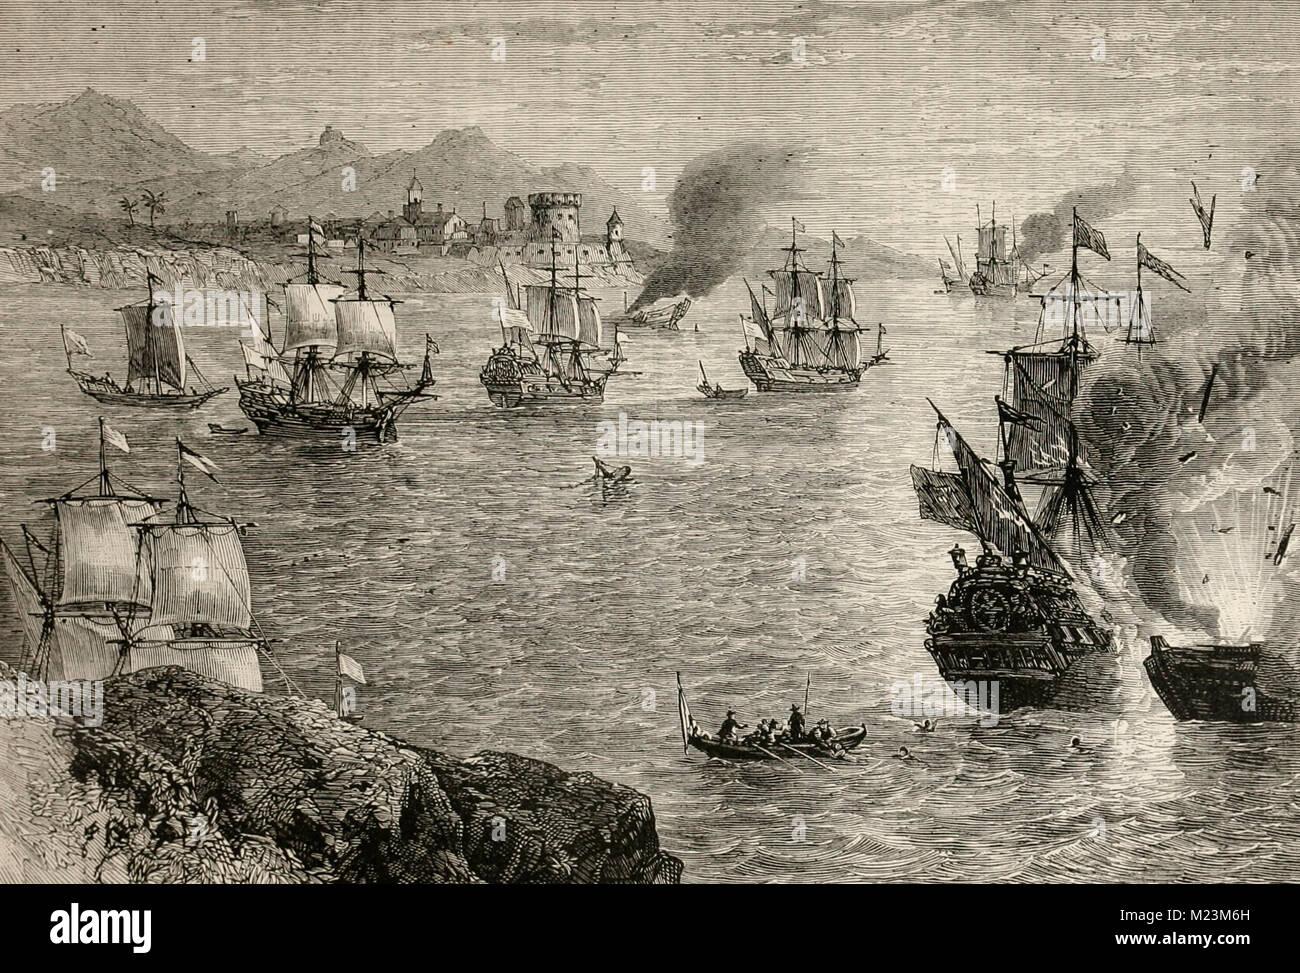 Henry Morgan's defeat of the Spanish Fleet - Stock Image